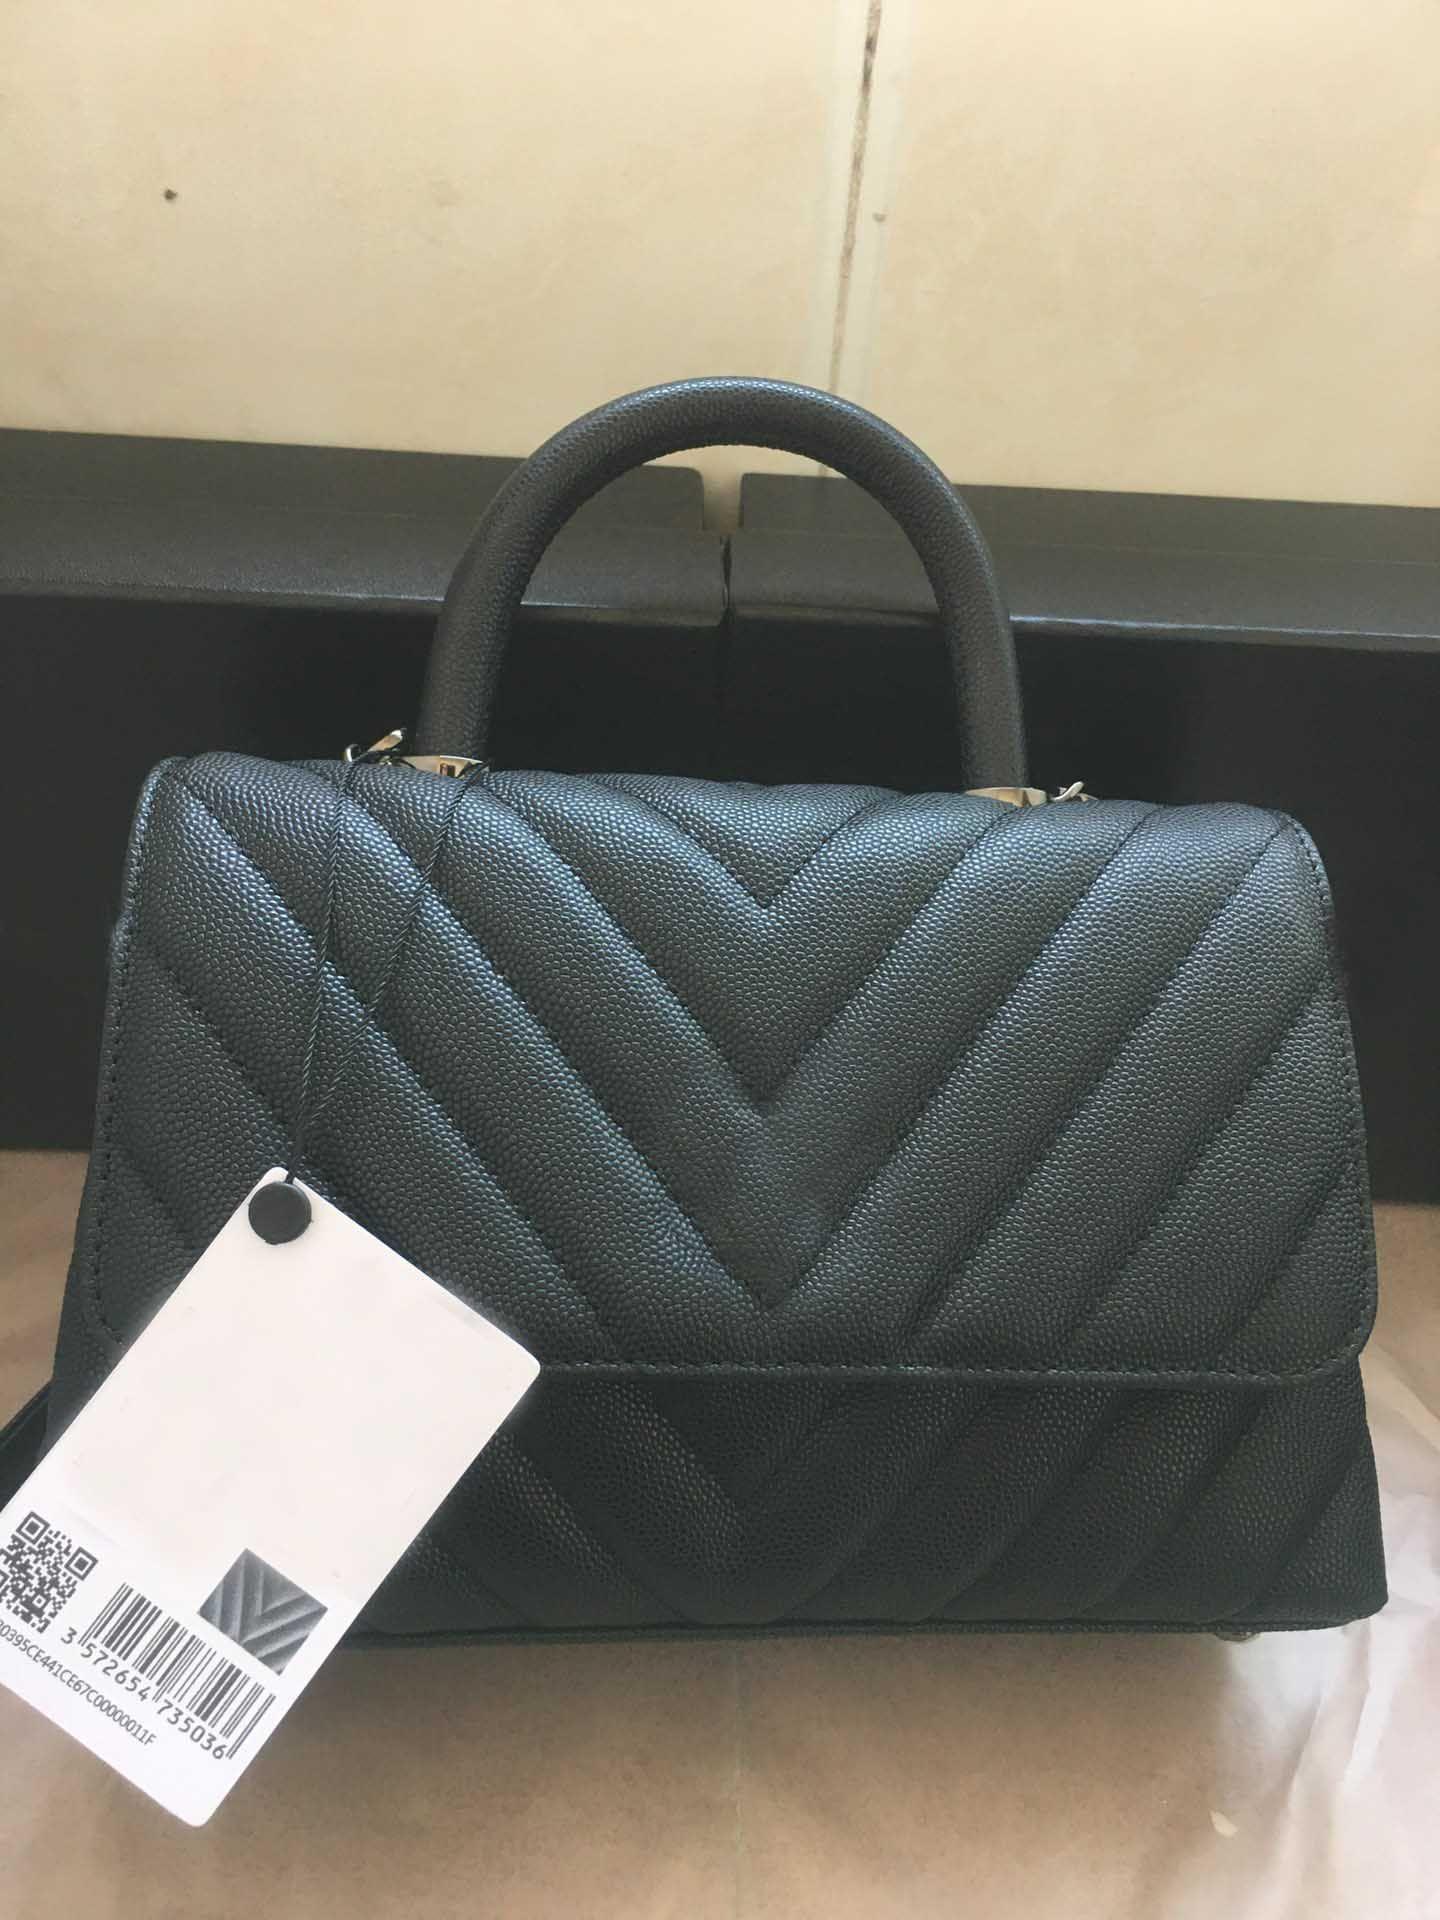 2020 New Fashion Double G Female Bag Luxury Designer Bags Womens Handbag Rhombus Messenger Bag Women Shoulder Bag A92990 24